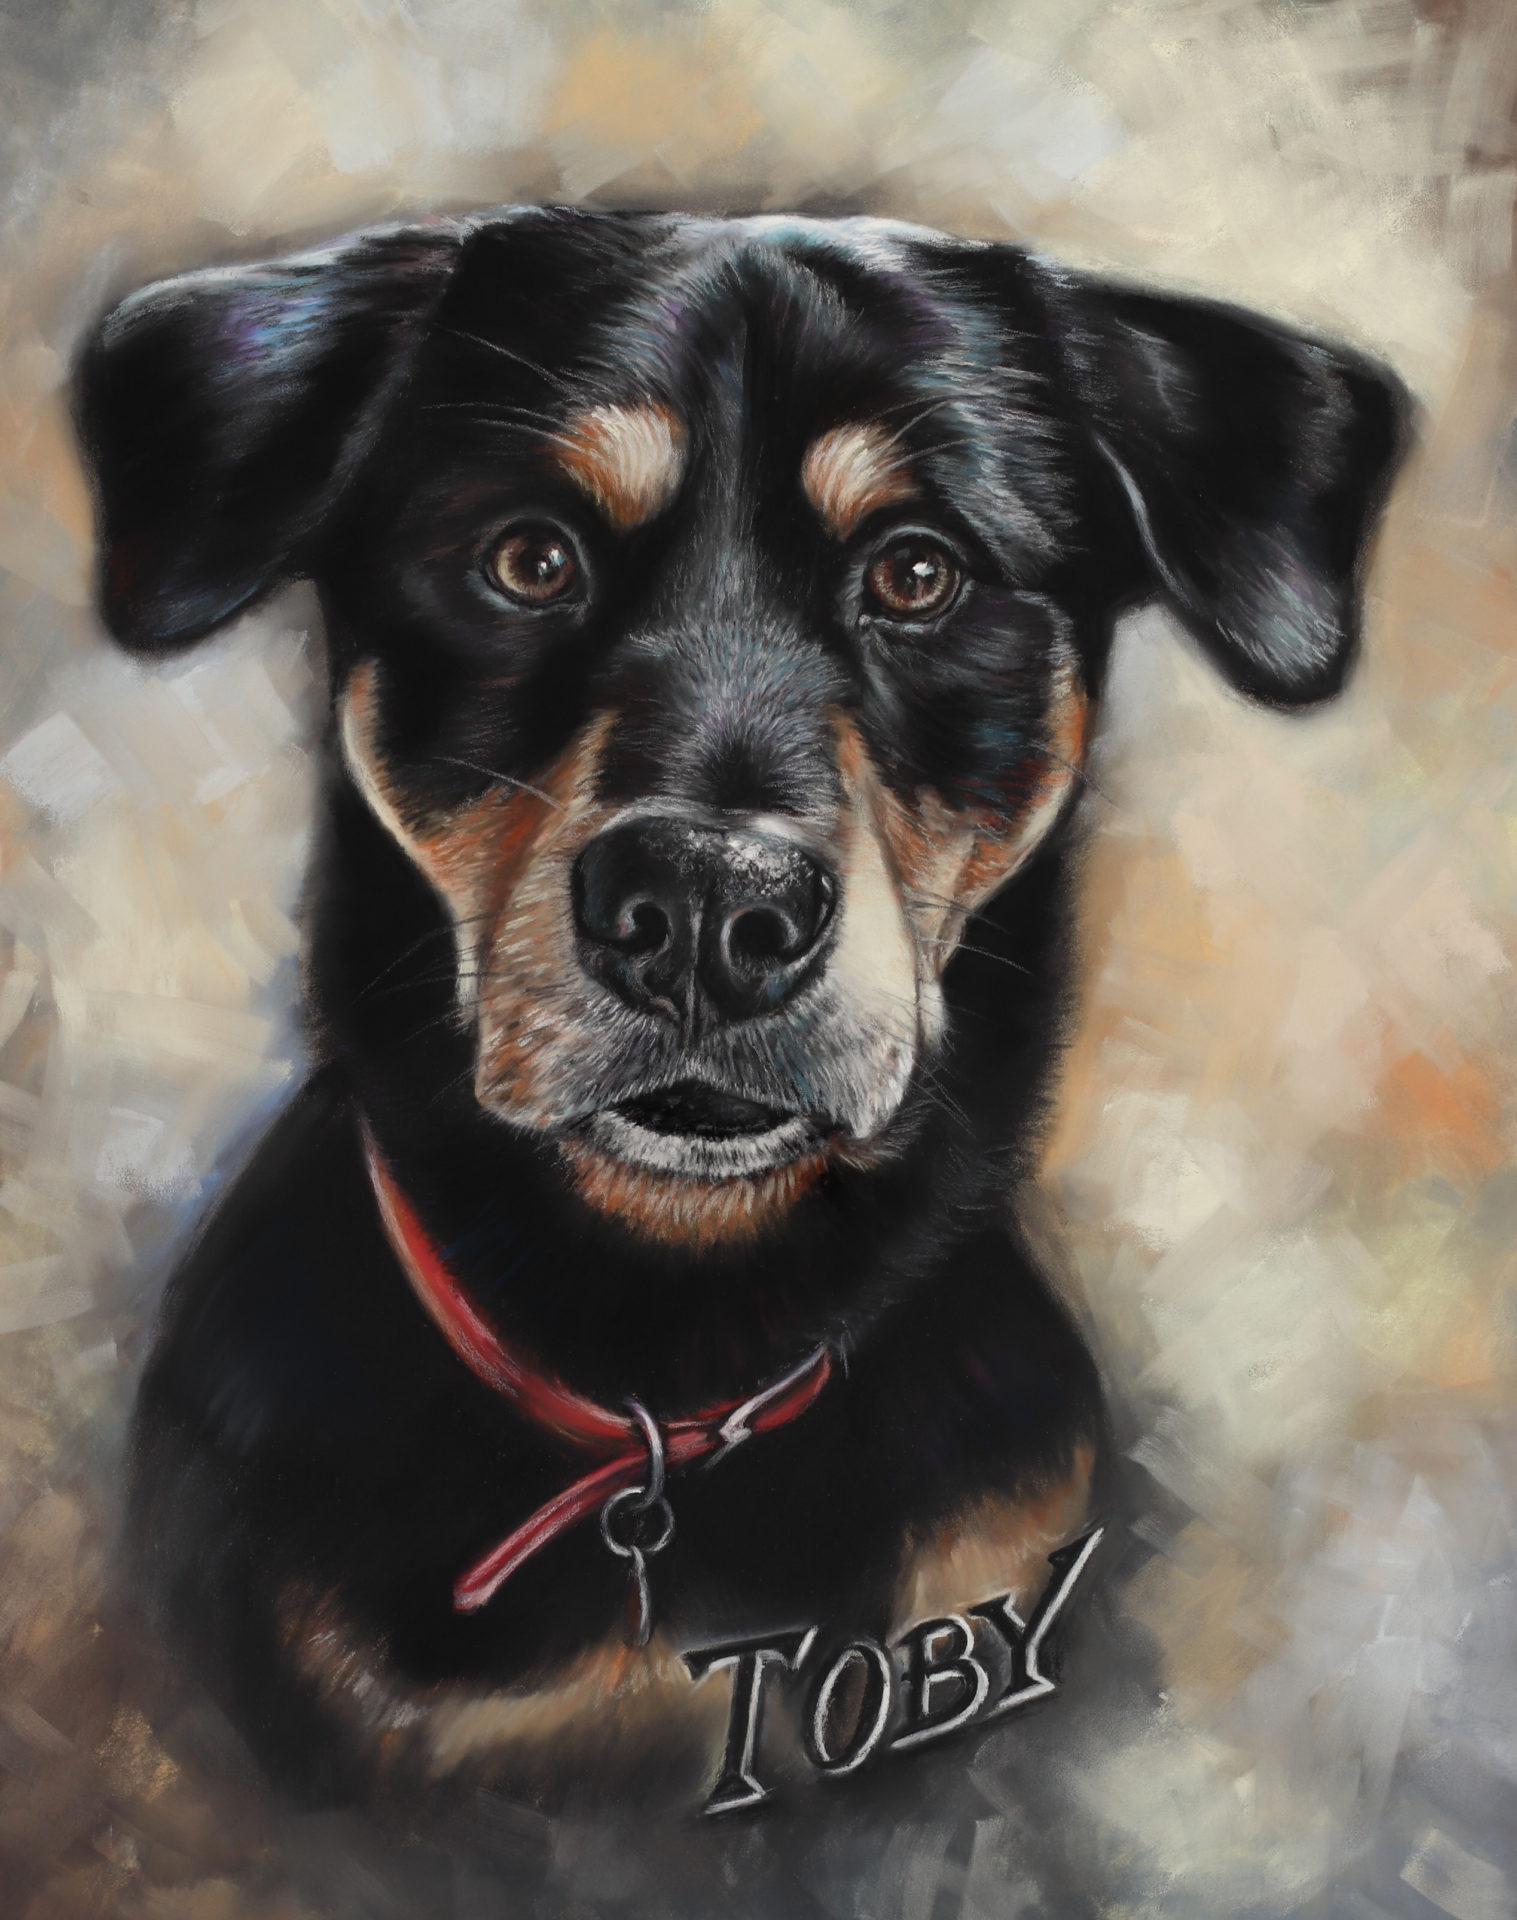 commission dog portrait uk